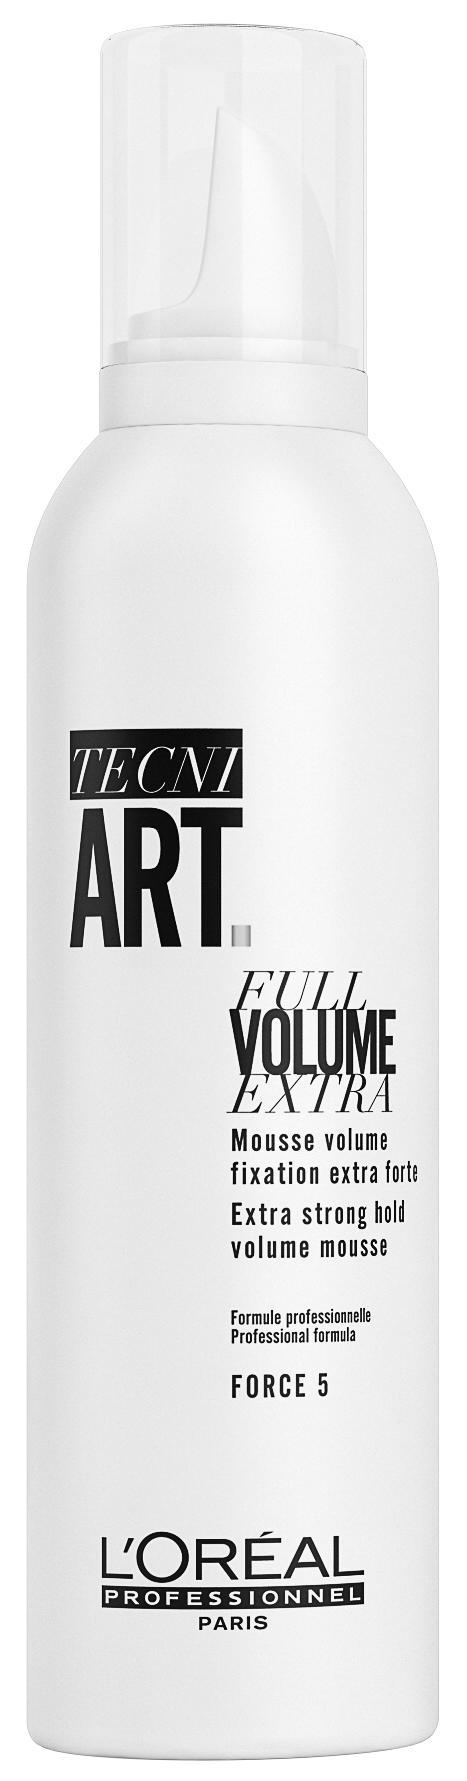 Tecni.art Full Volum Extra 250 ml